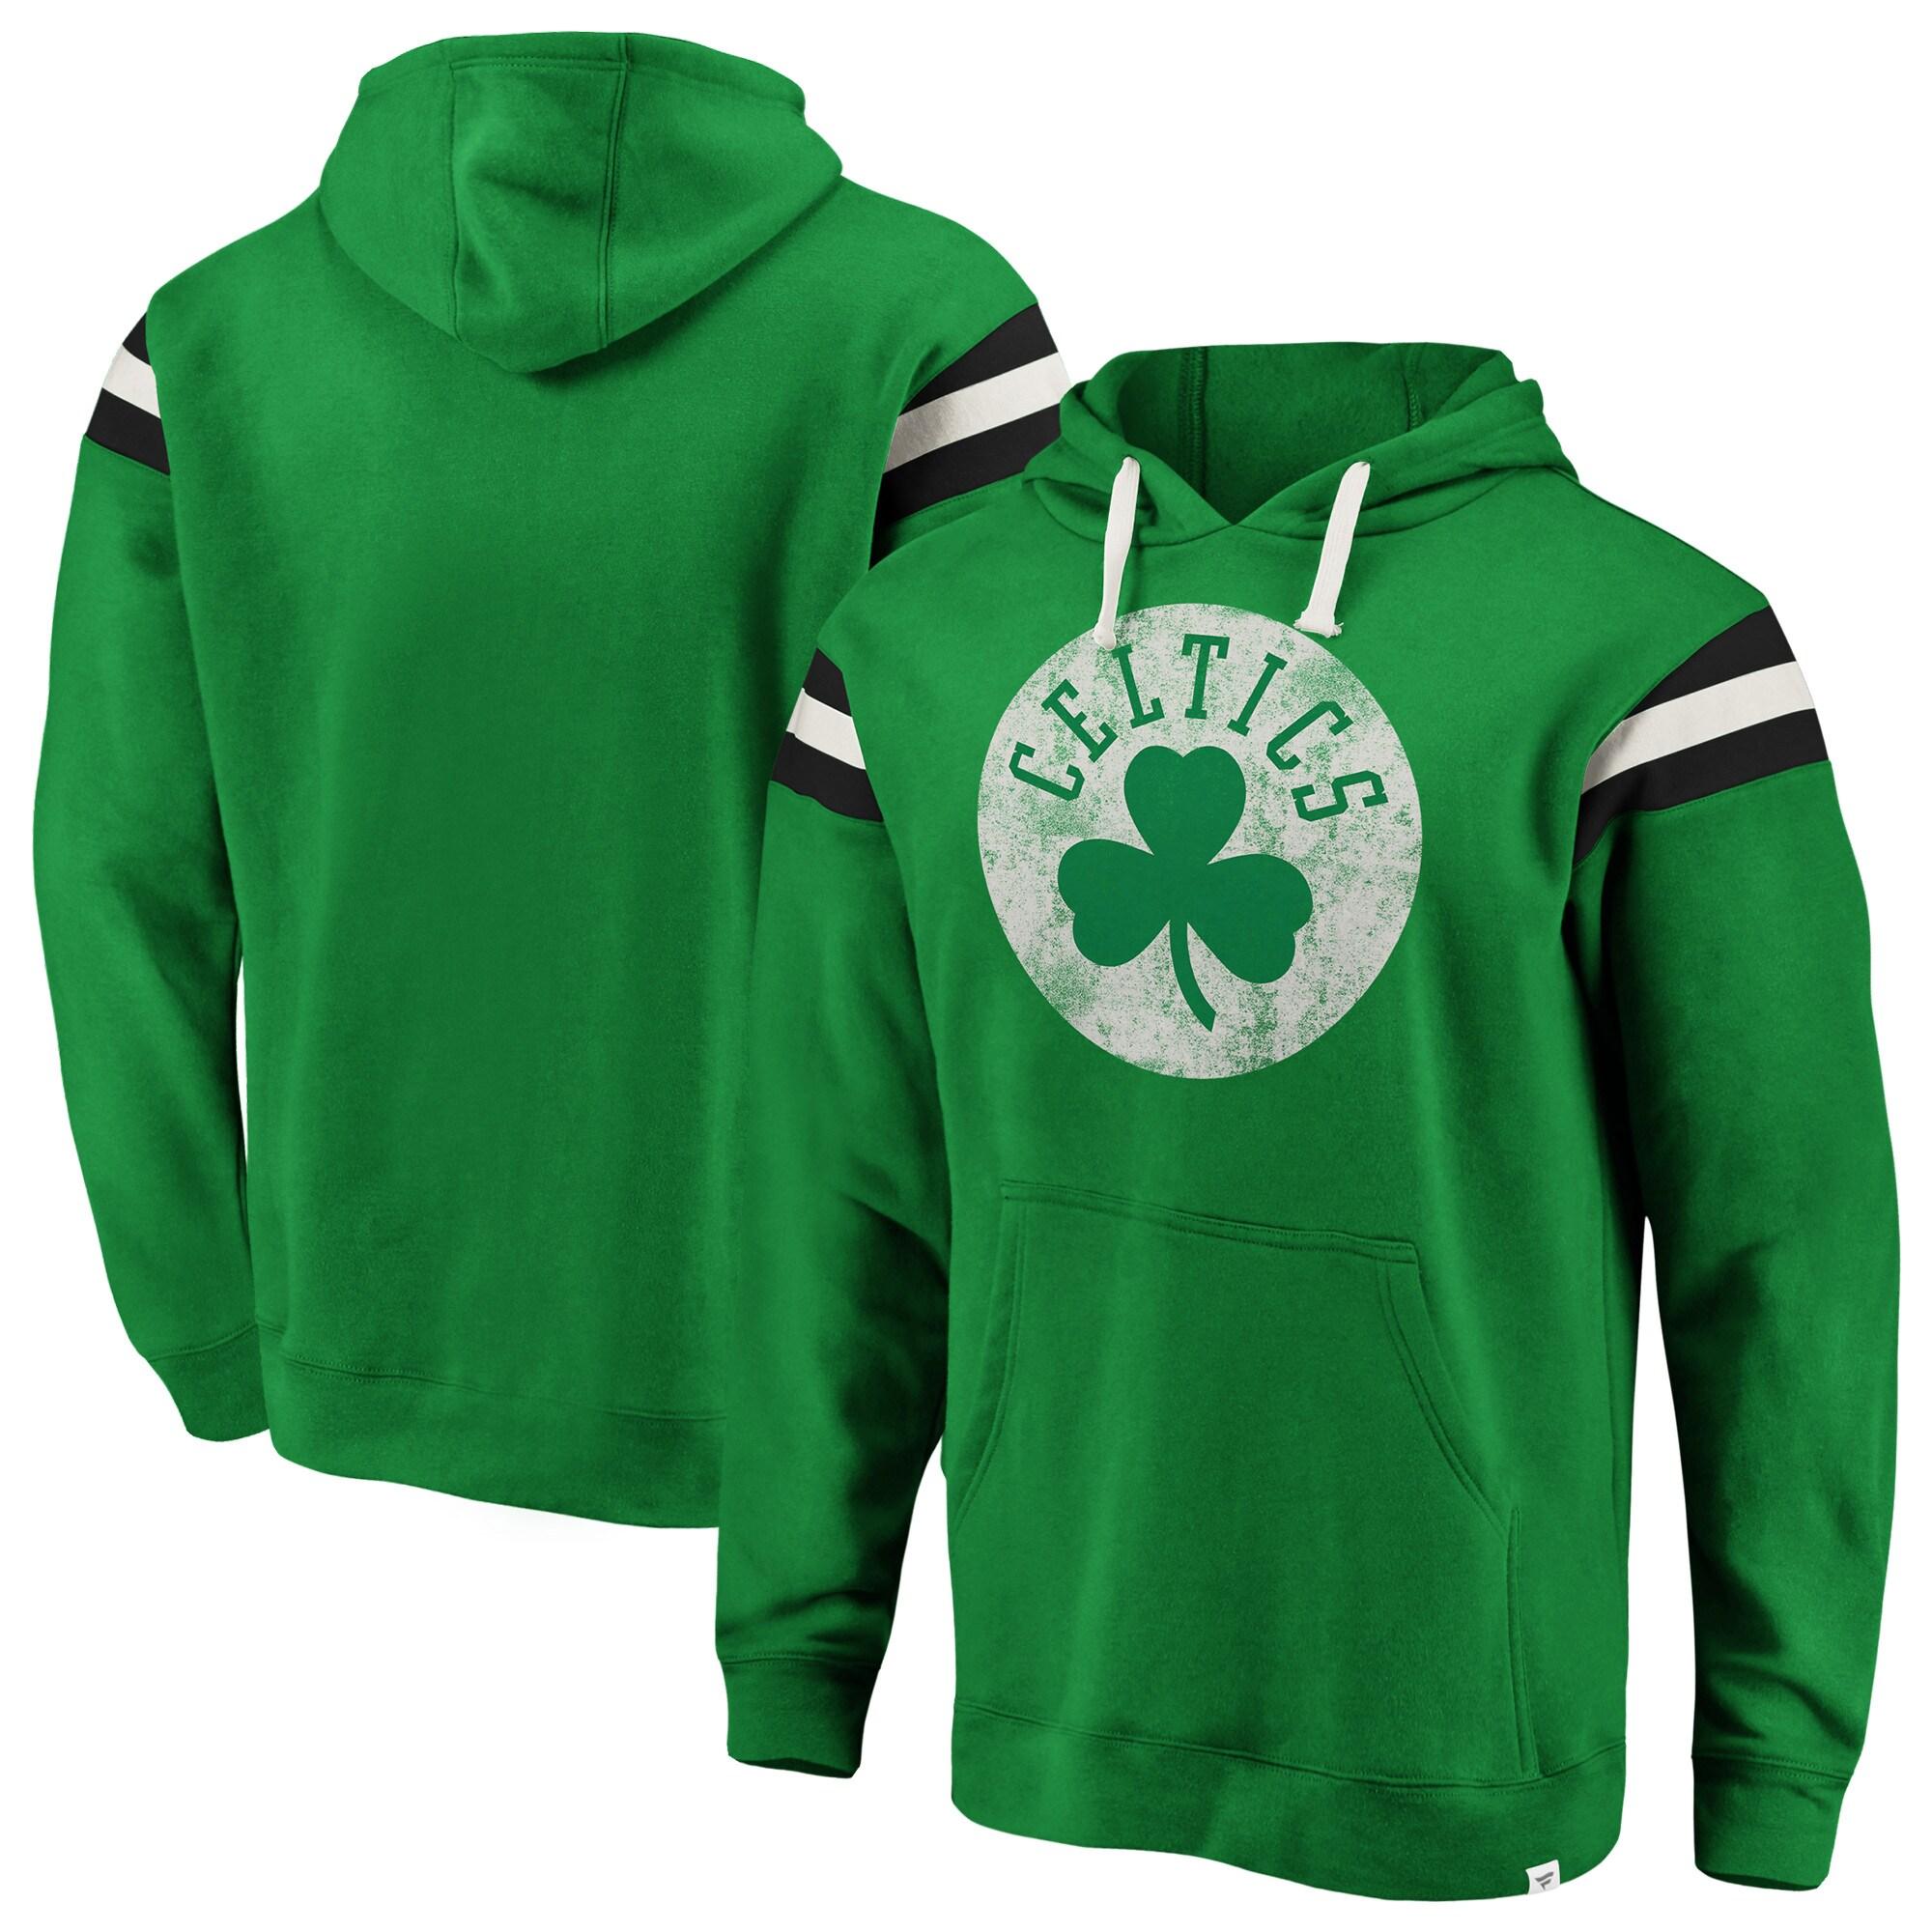 Boston Celtics Fanatics Branded Big & Tall True Classic Vintage Retro Stripe Pullover Hoodie - Kelly Green